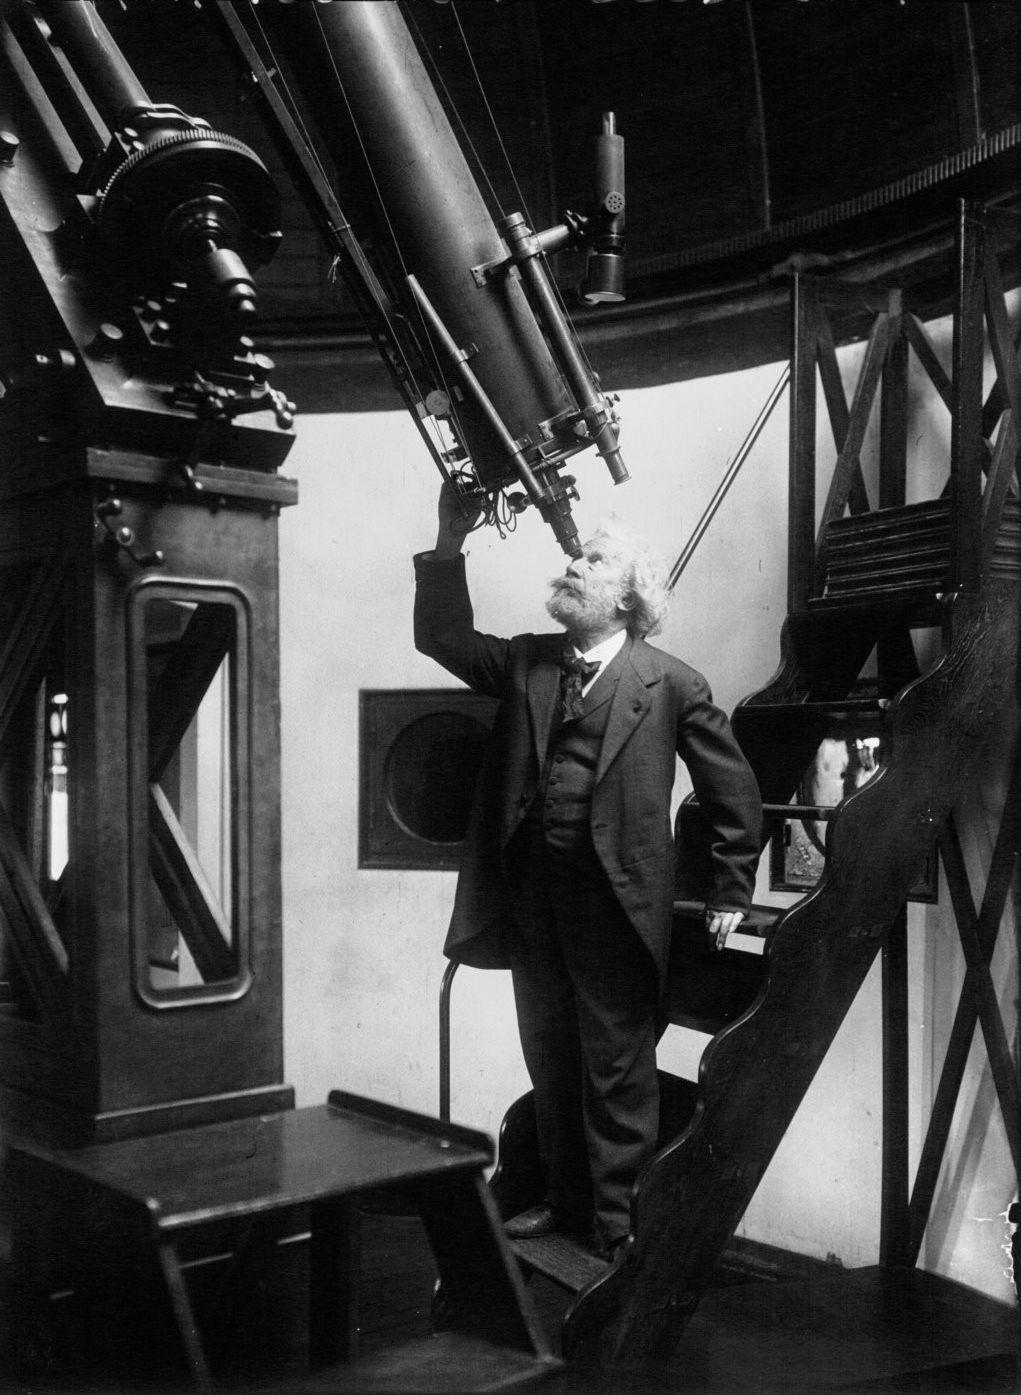 flammarion-telescope.jpg